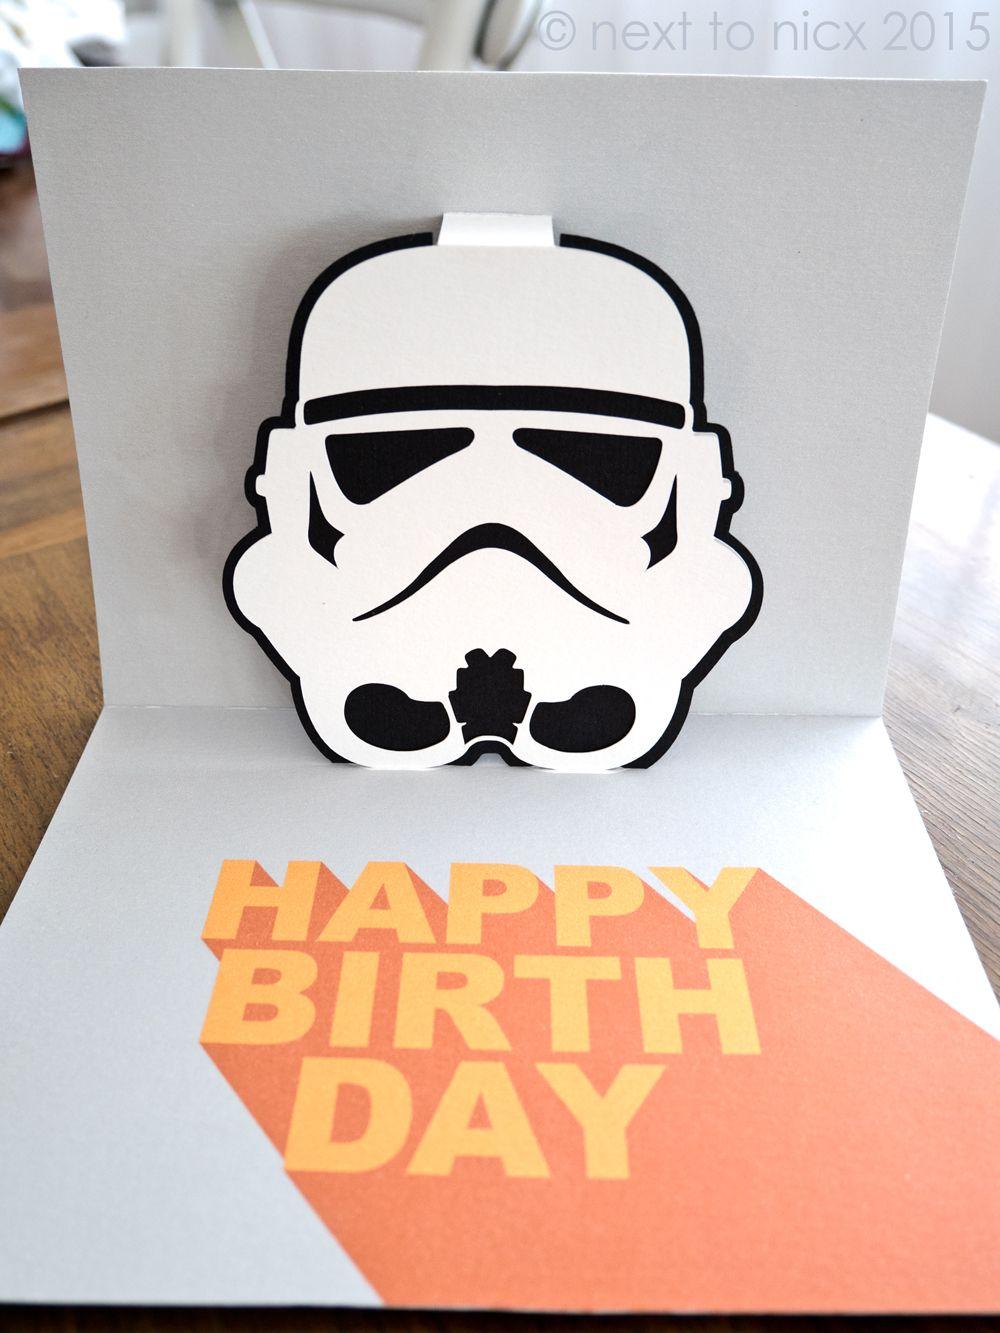 Storm trooper Pop Up Card Geburtstagskarte vorlage, Pop